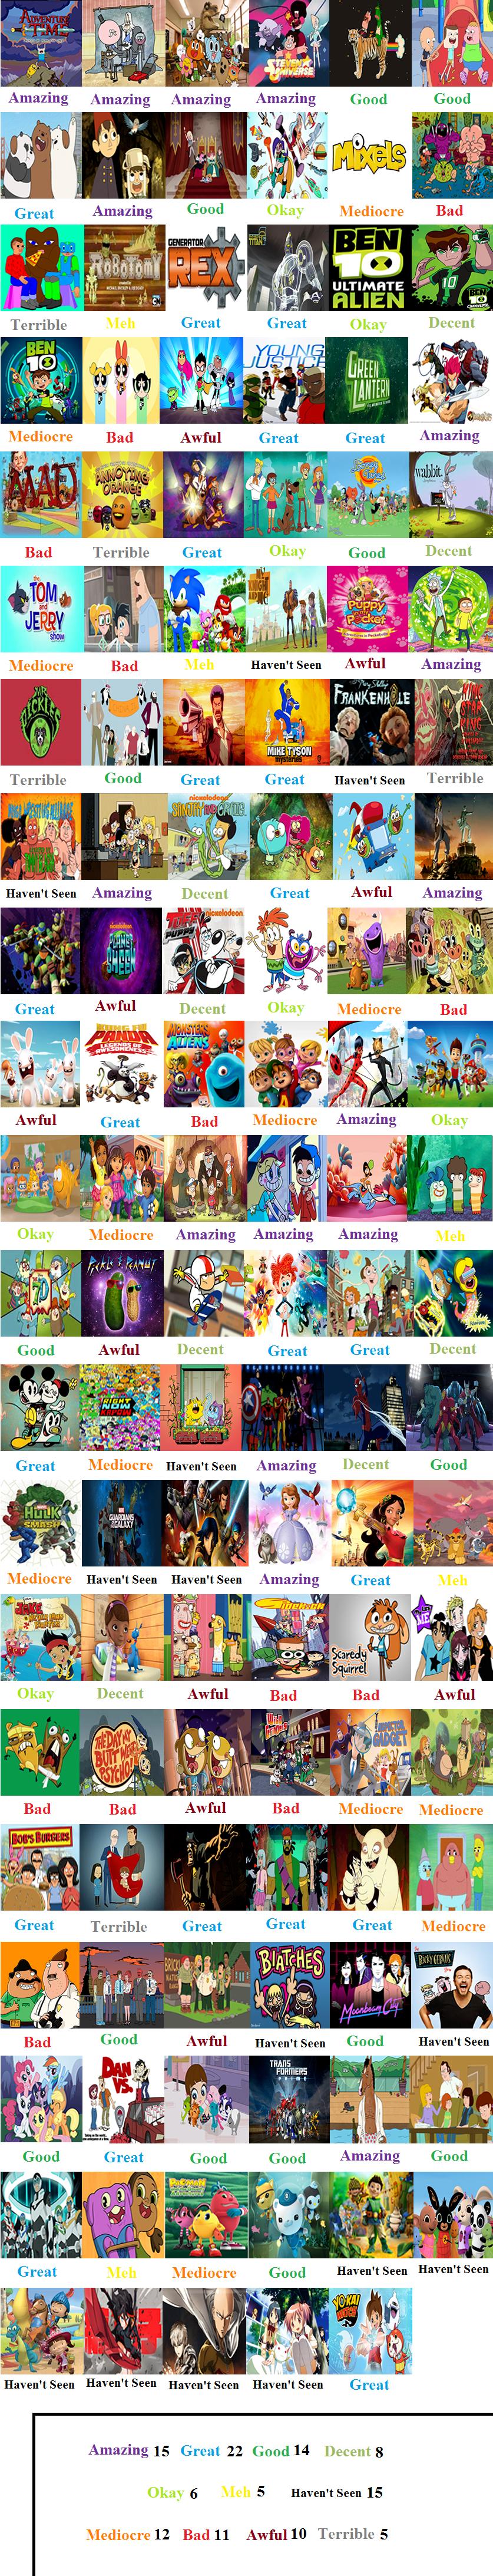 Cartoons Of The 2010s by MrAnimatedToon on DeviantArt